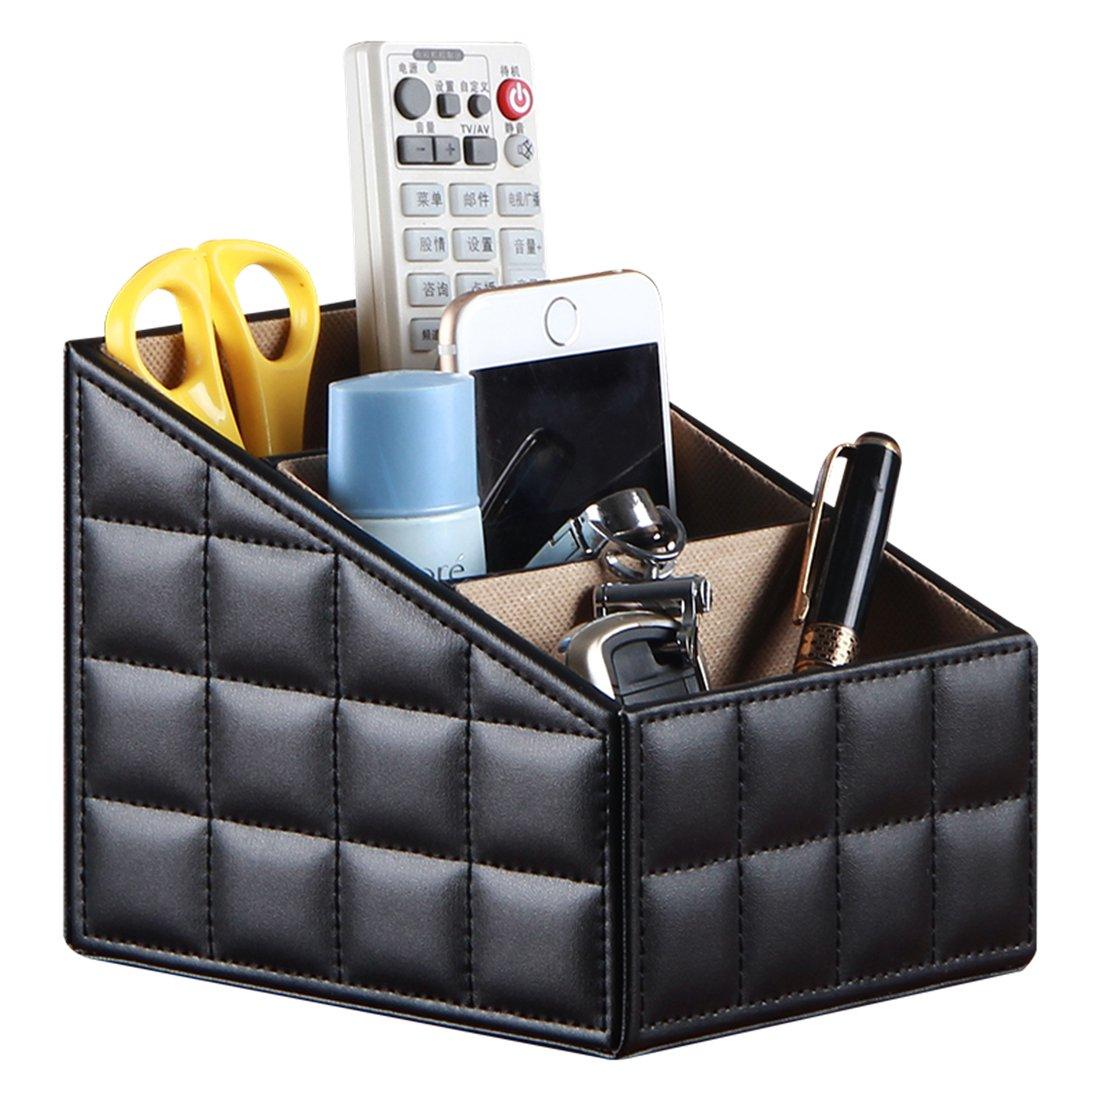 Remote Control Holder Leather TV Remote Caddy Organizer Media Organizer 3 Slot Office Supply Storage Rack(Black)